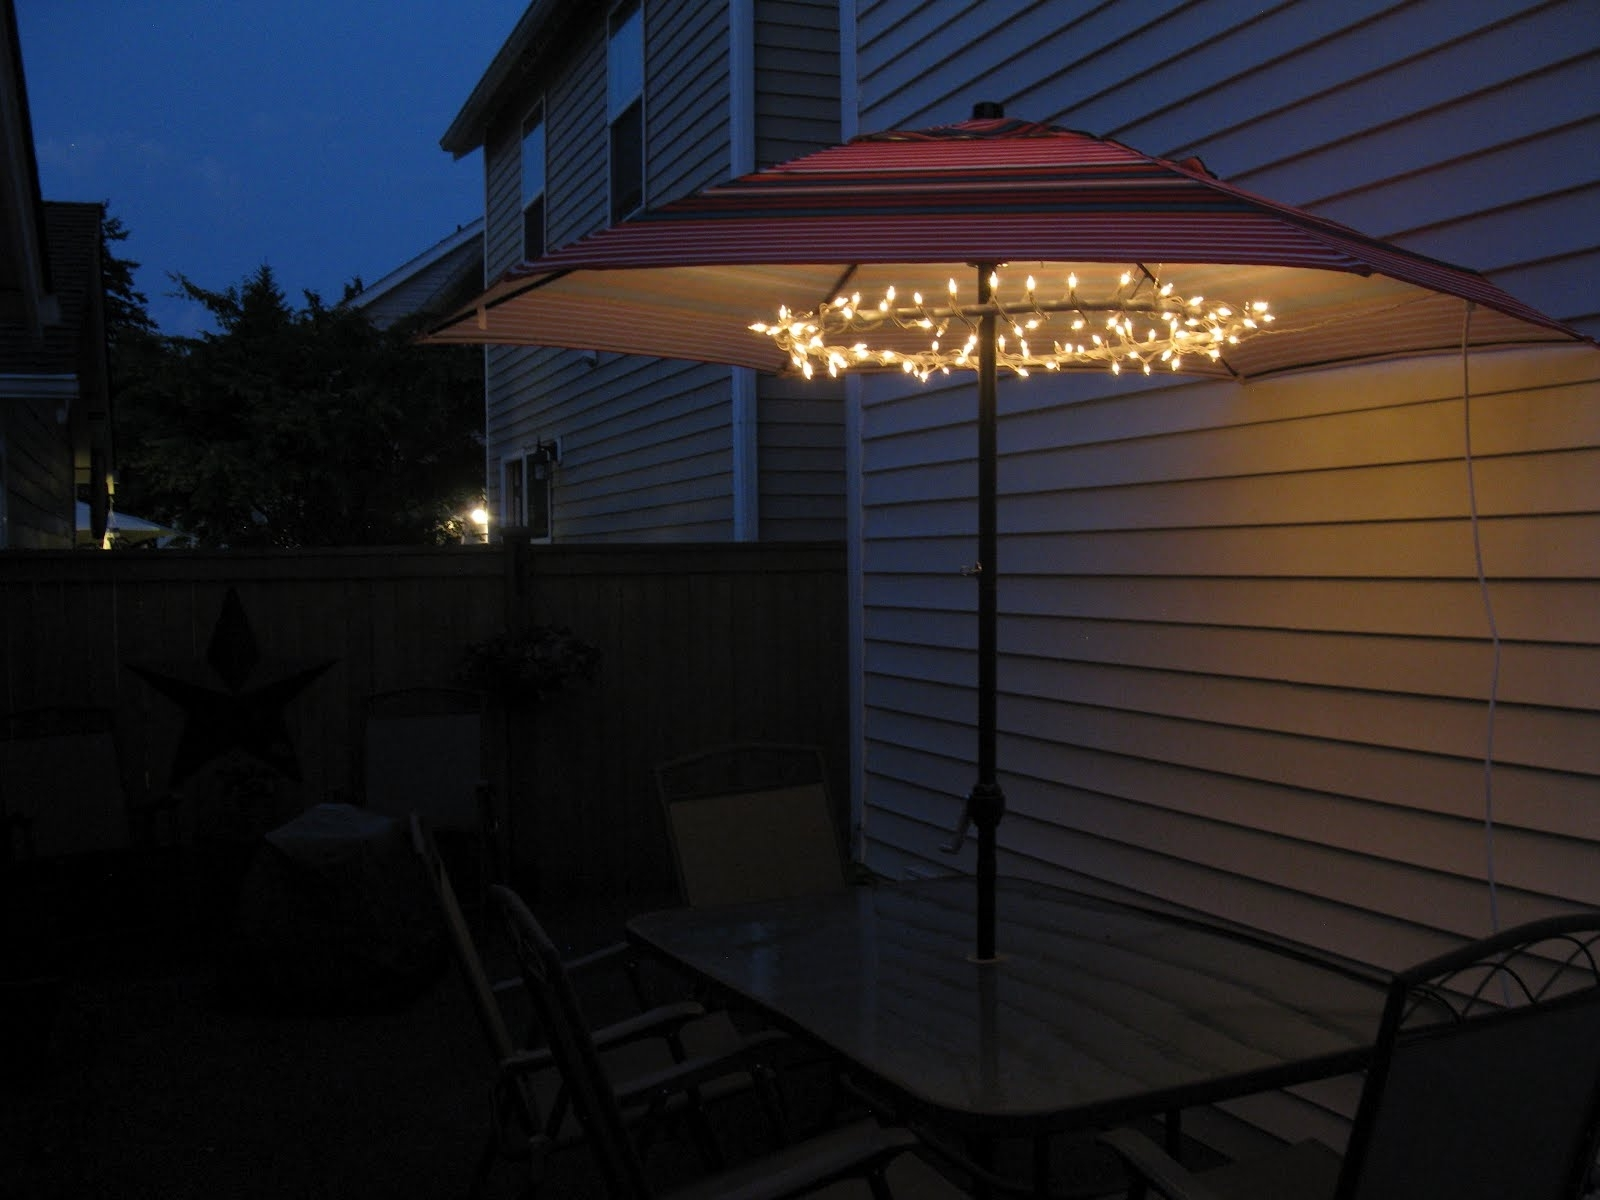 Most Popular Lighted Umbrellas For Patio Inside Amazing Patio Umbrella Lights — Wilson Home Ideas : Beautiful Patio (View 14 of 20)